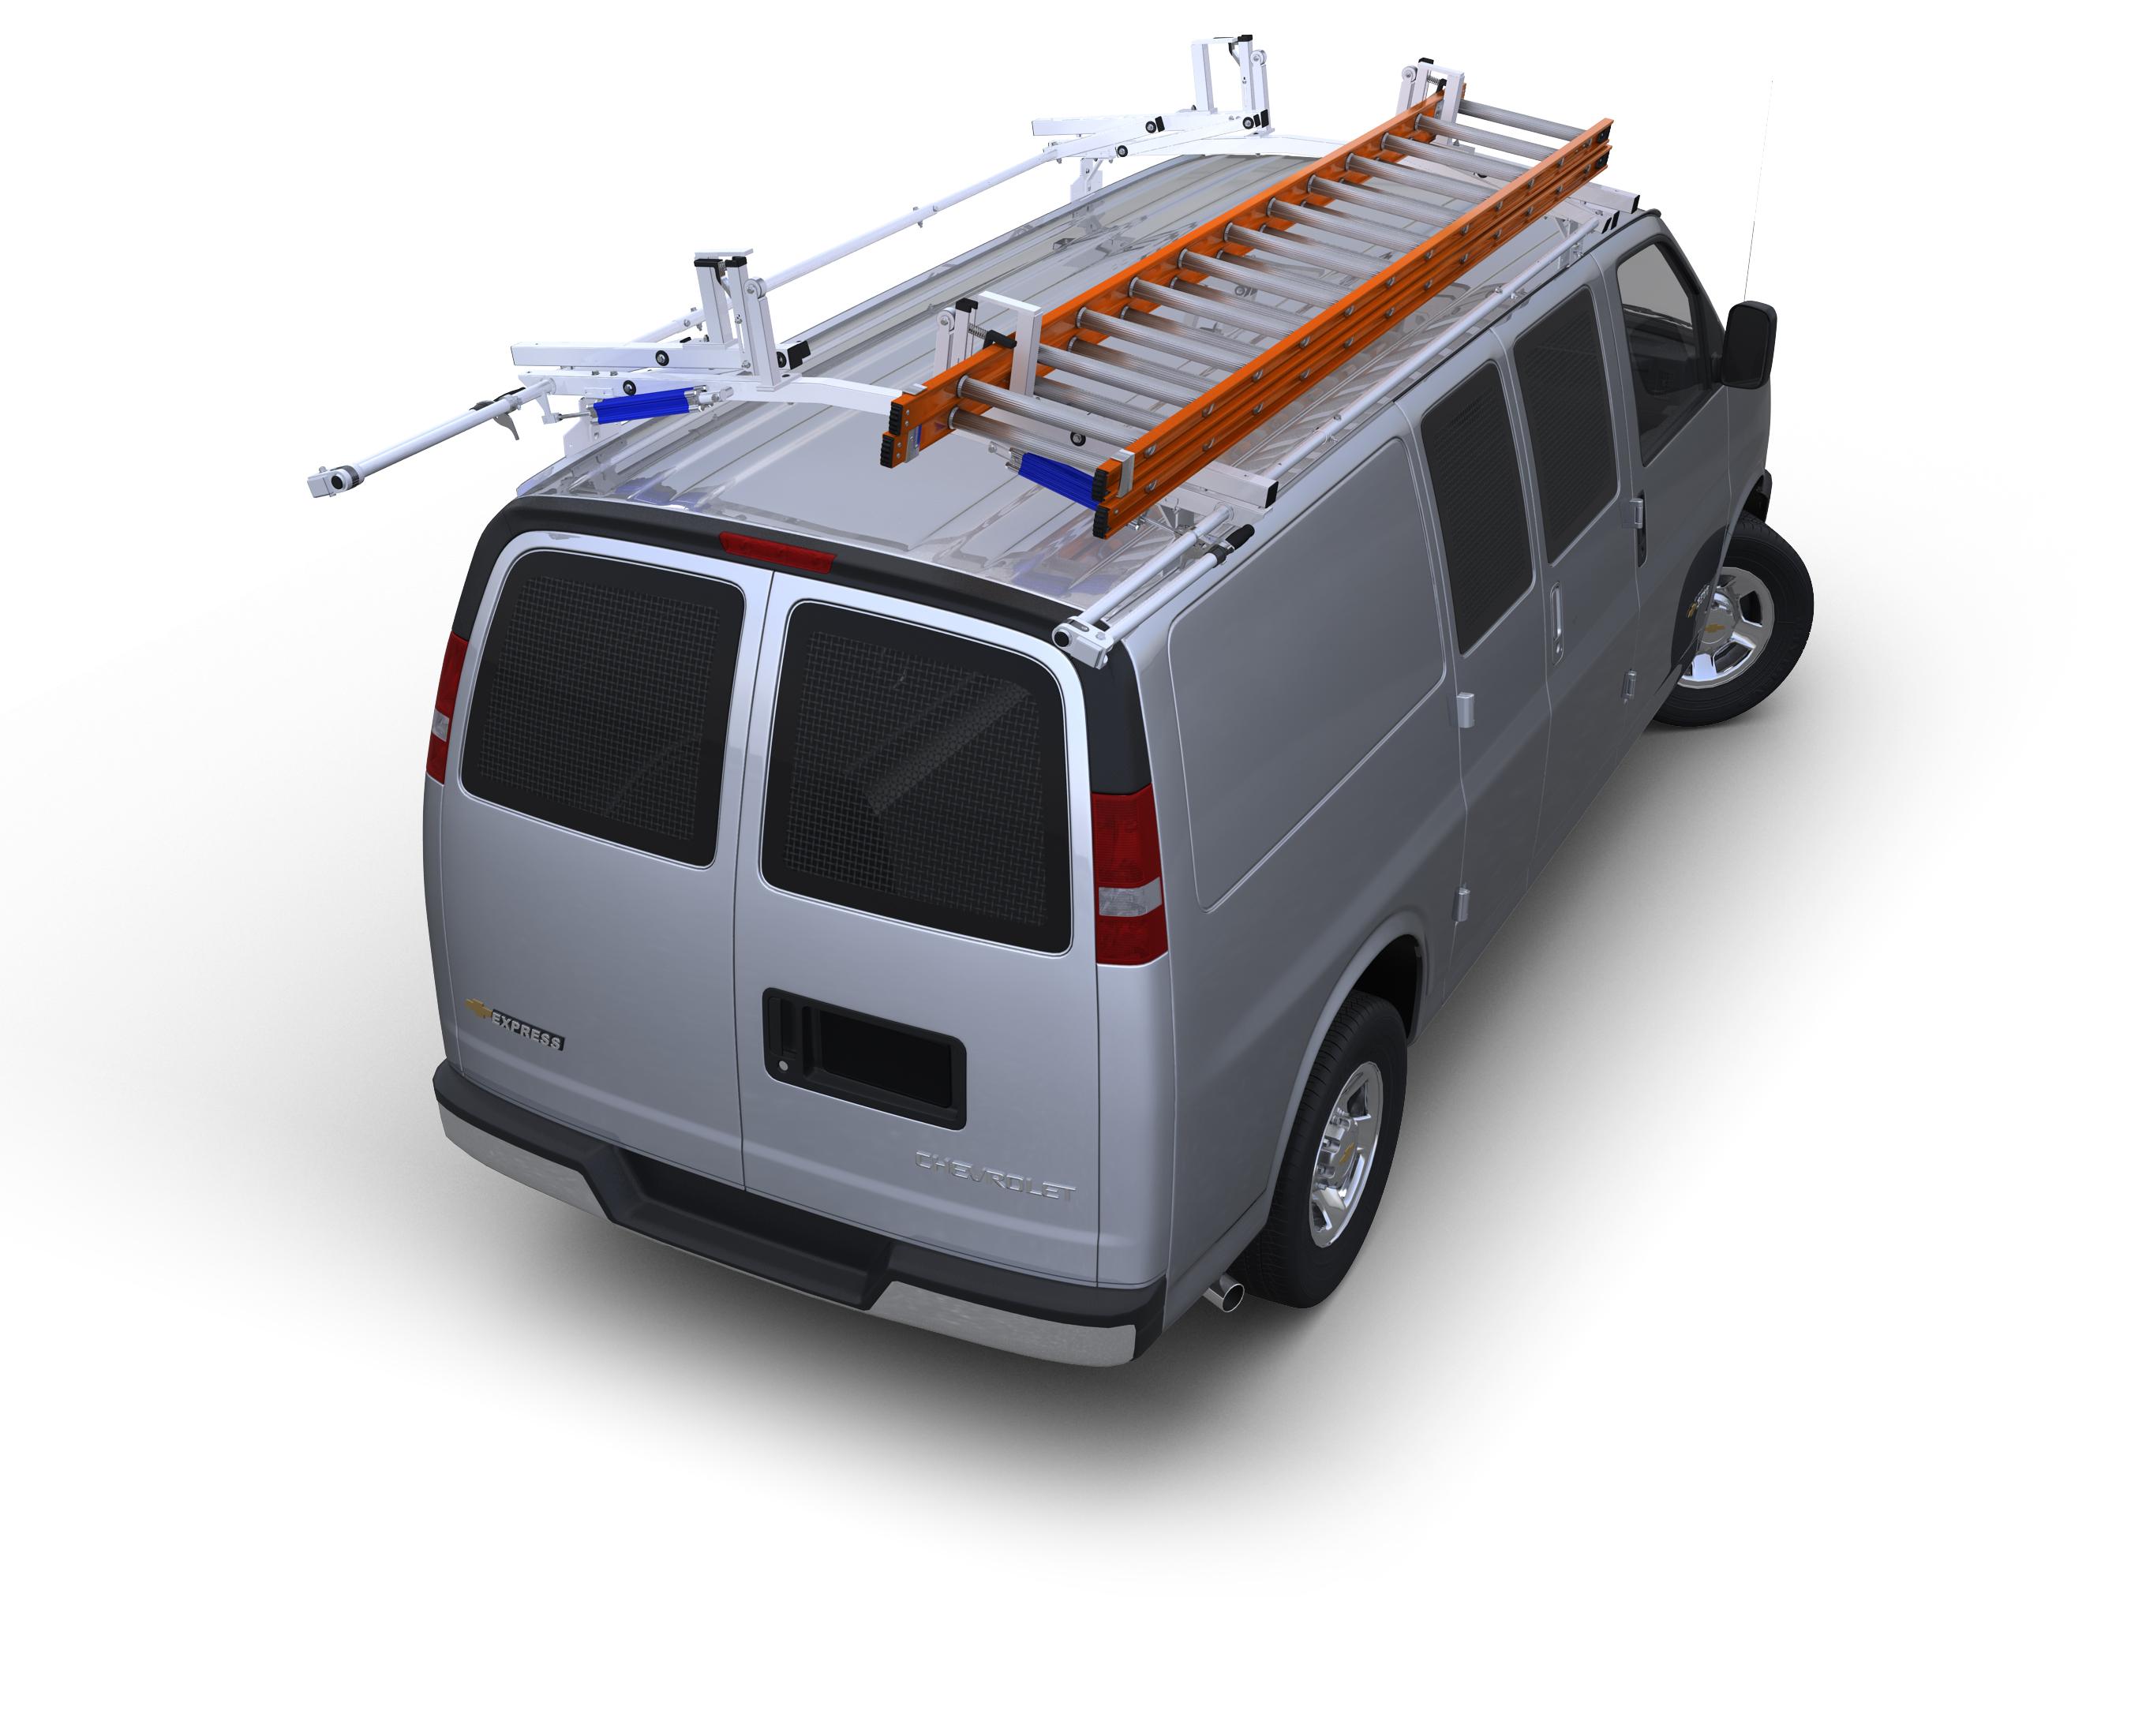 Maxi-Stor Bin System for High Roof Vans